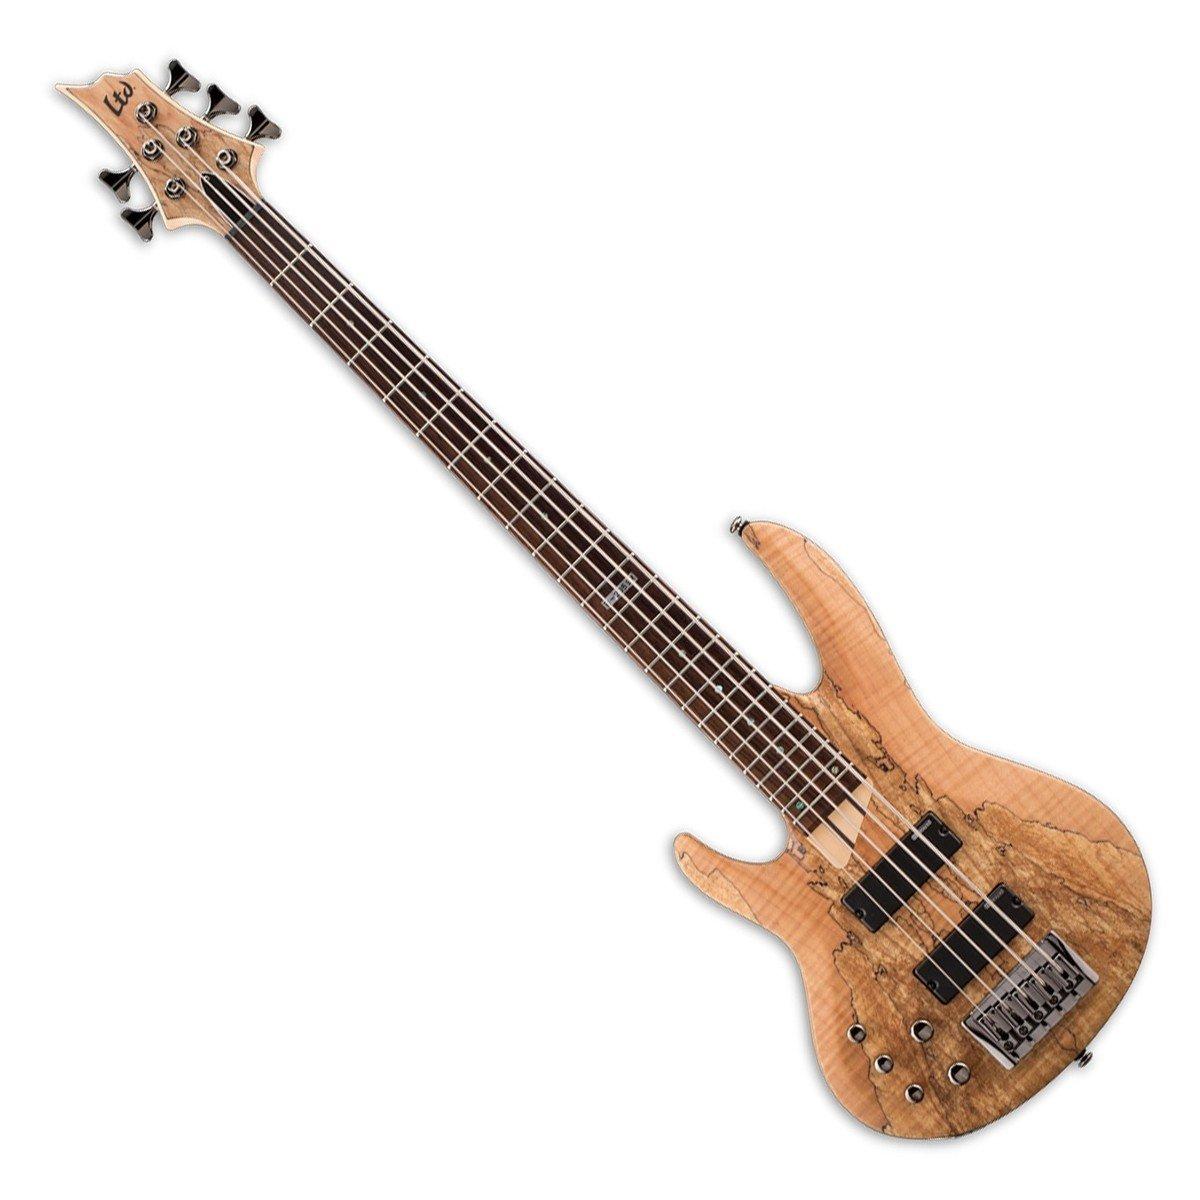 ESP LTD B-205SM LH NATURAL SATIN B205SM 5弦ベース 左利き用 エレキ ベース エレクトリックベース [並行輸入品]   B07DDBPXKG